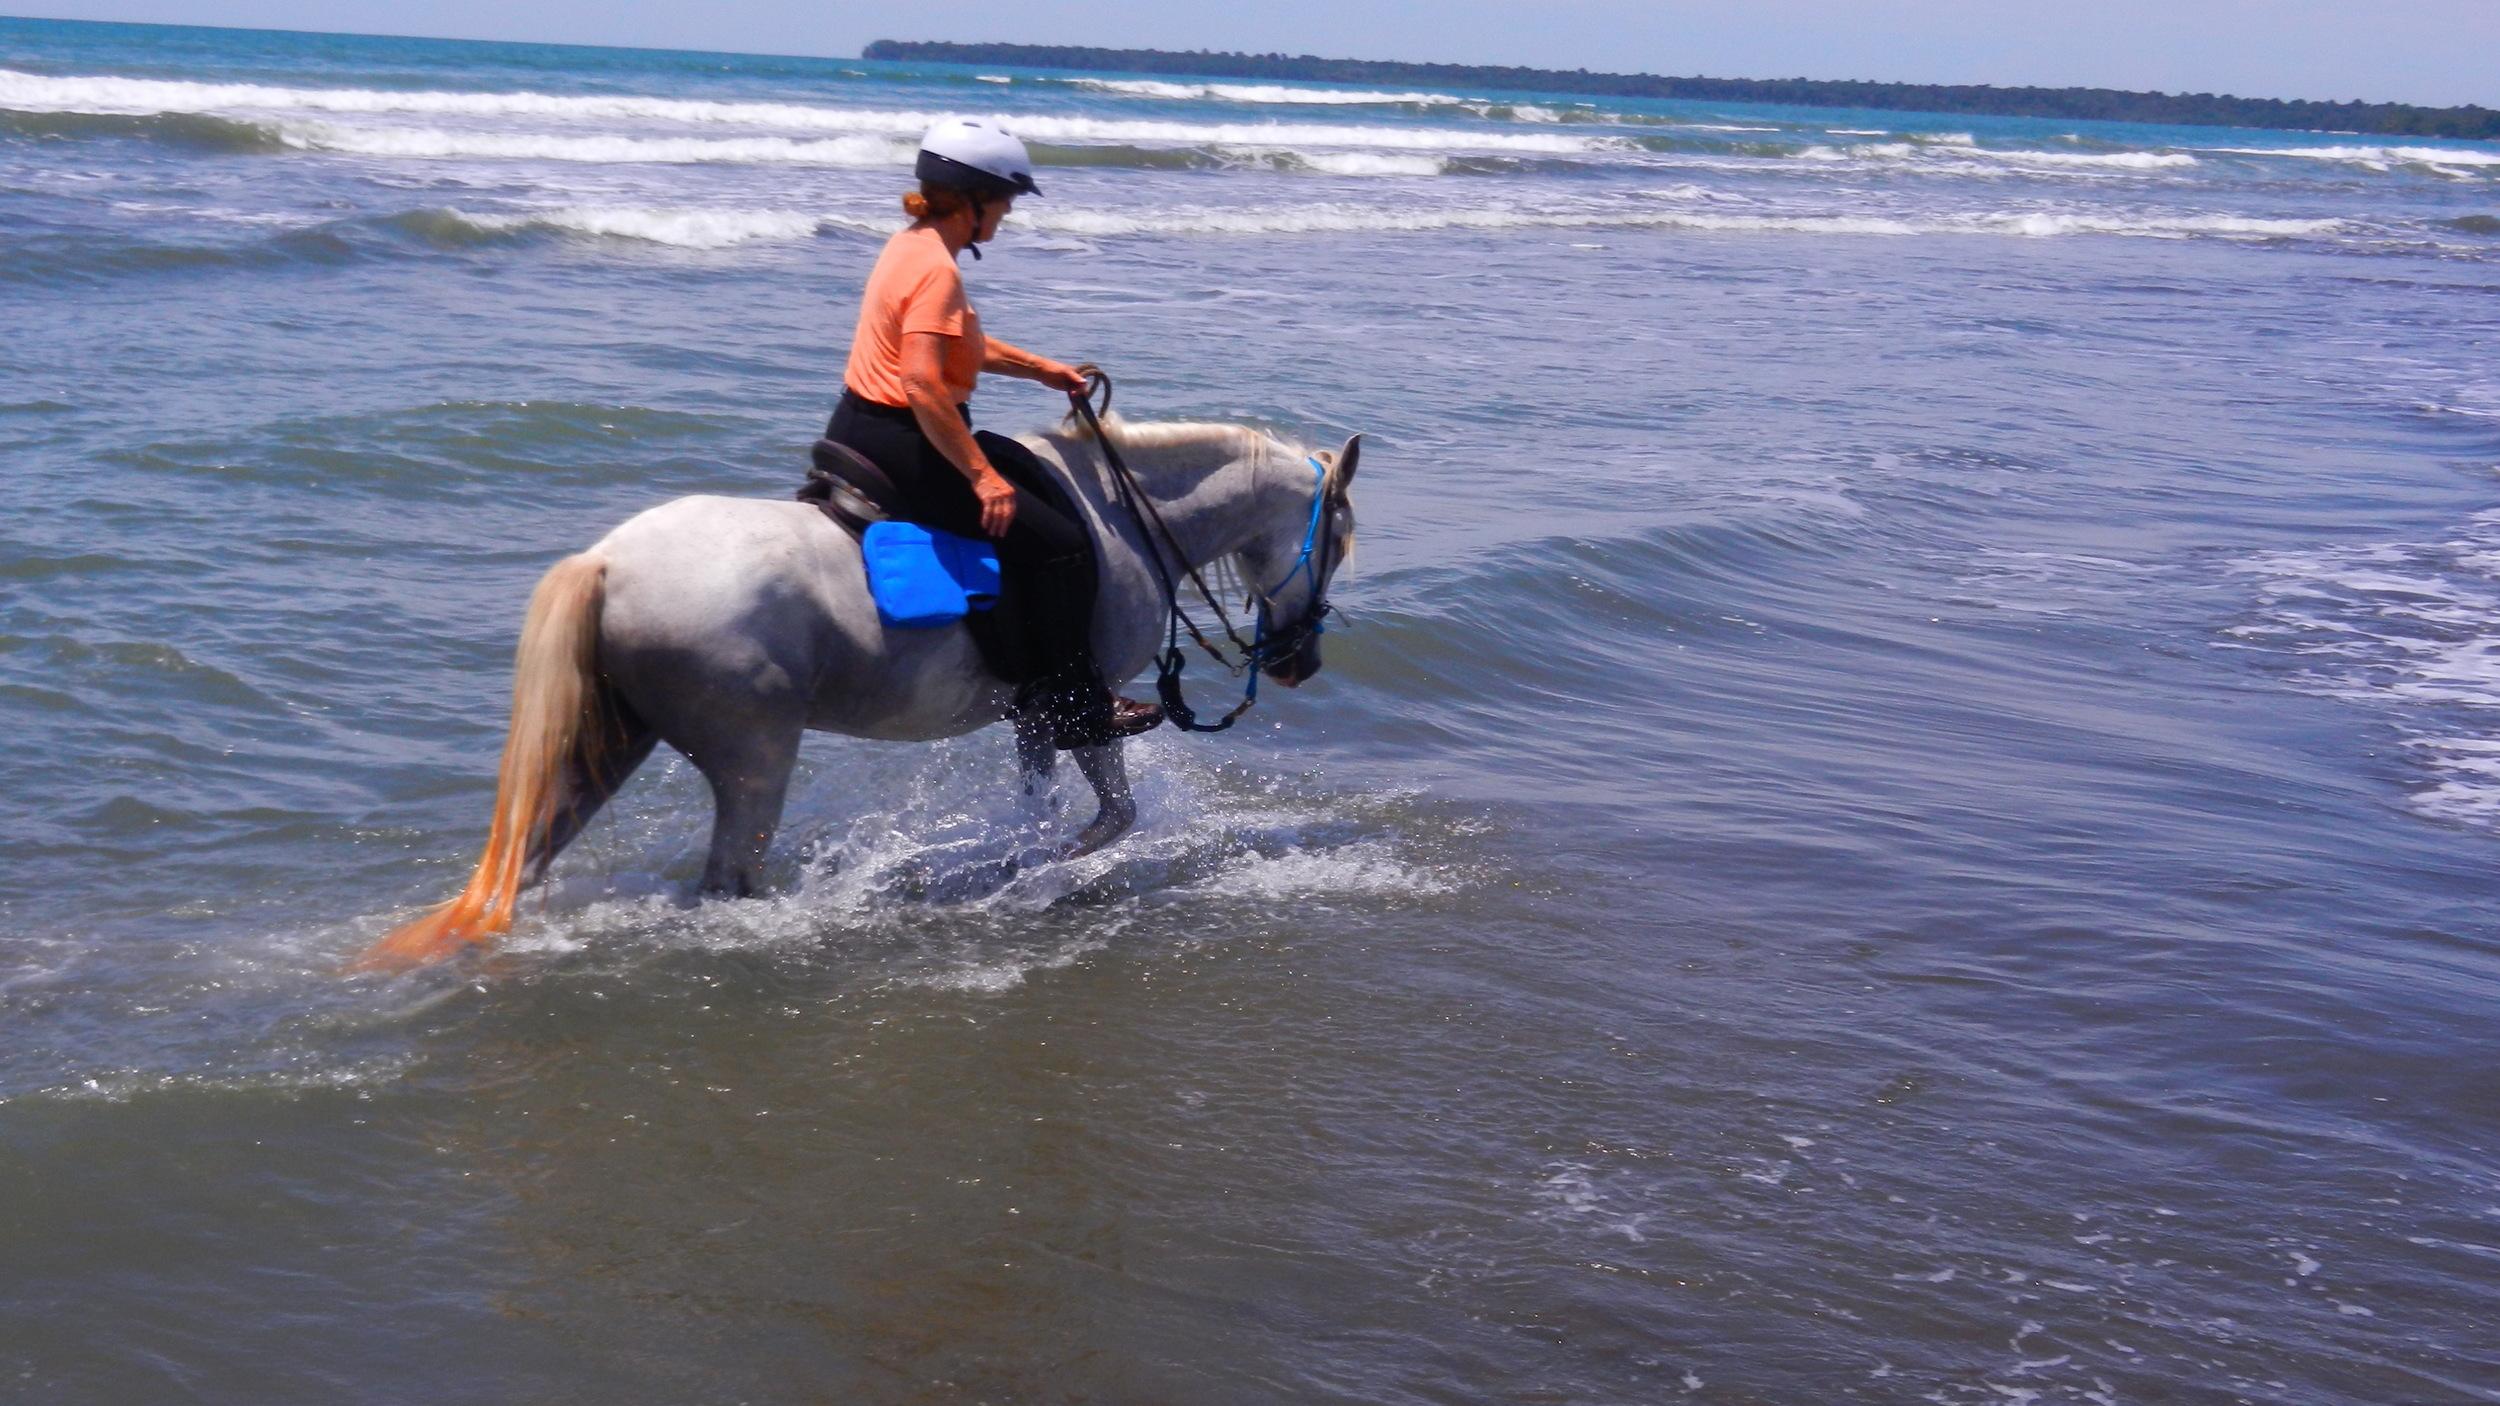 Horse riding Caribbean Sea